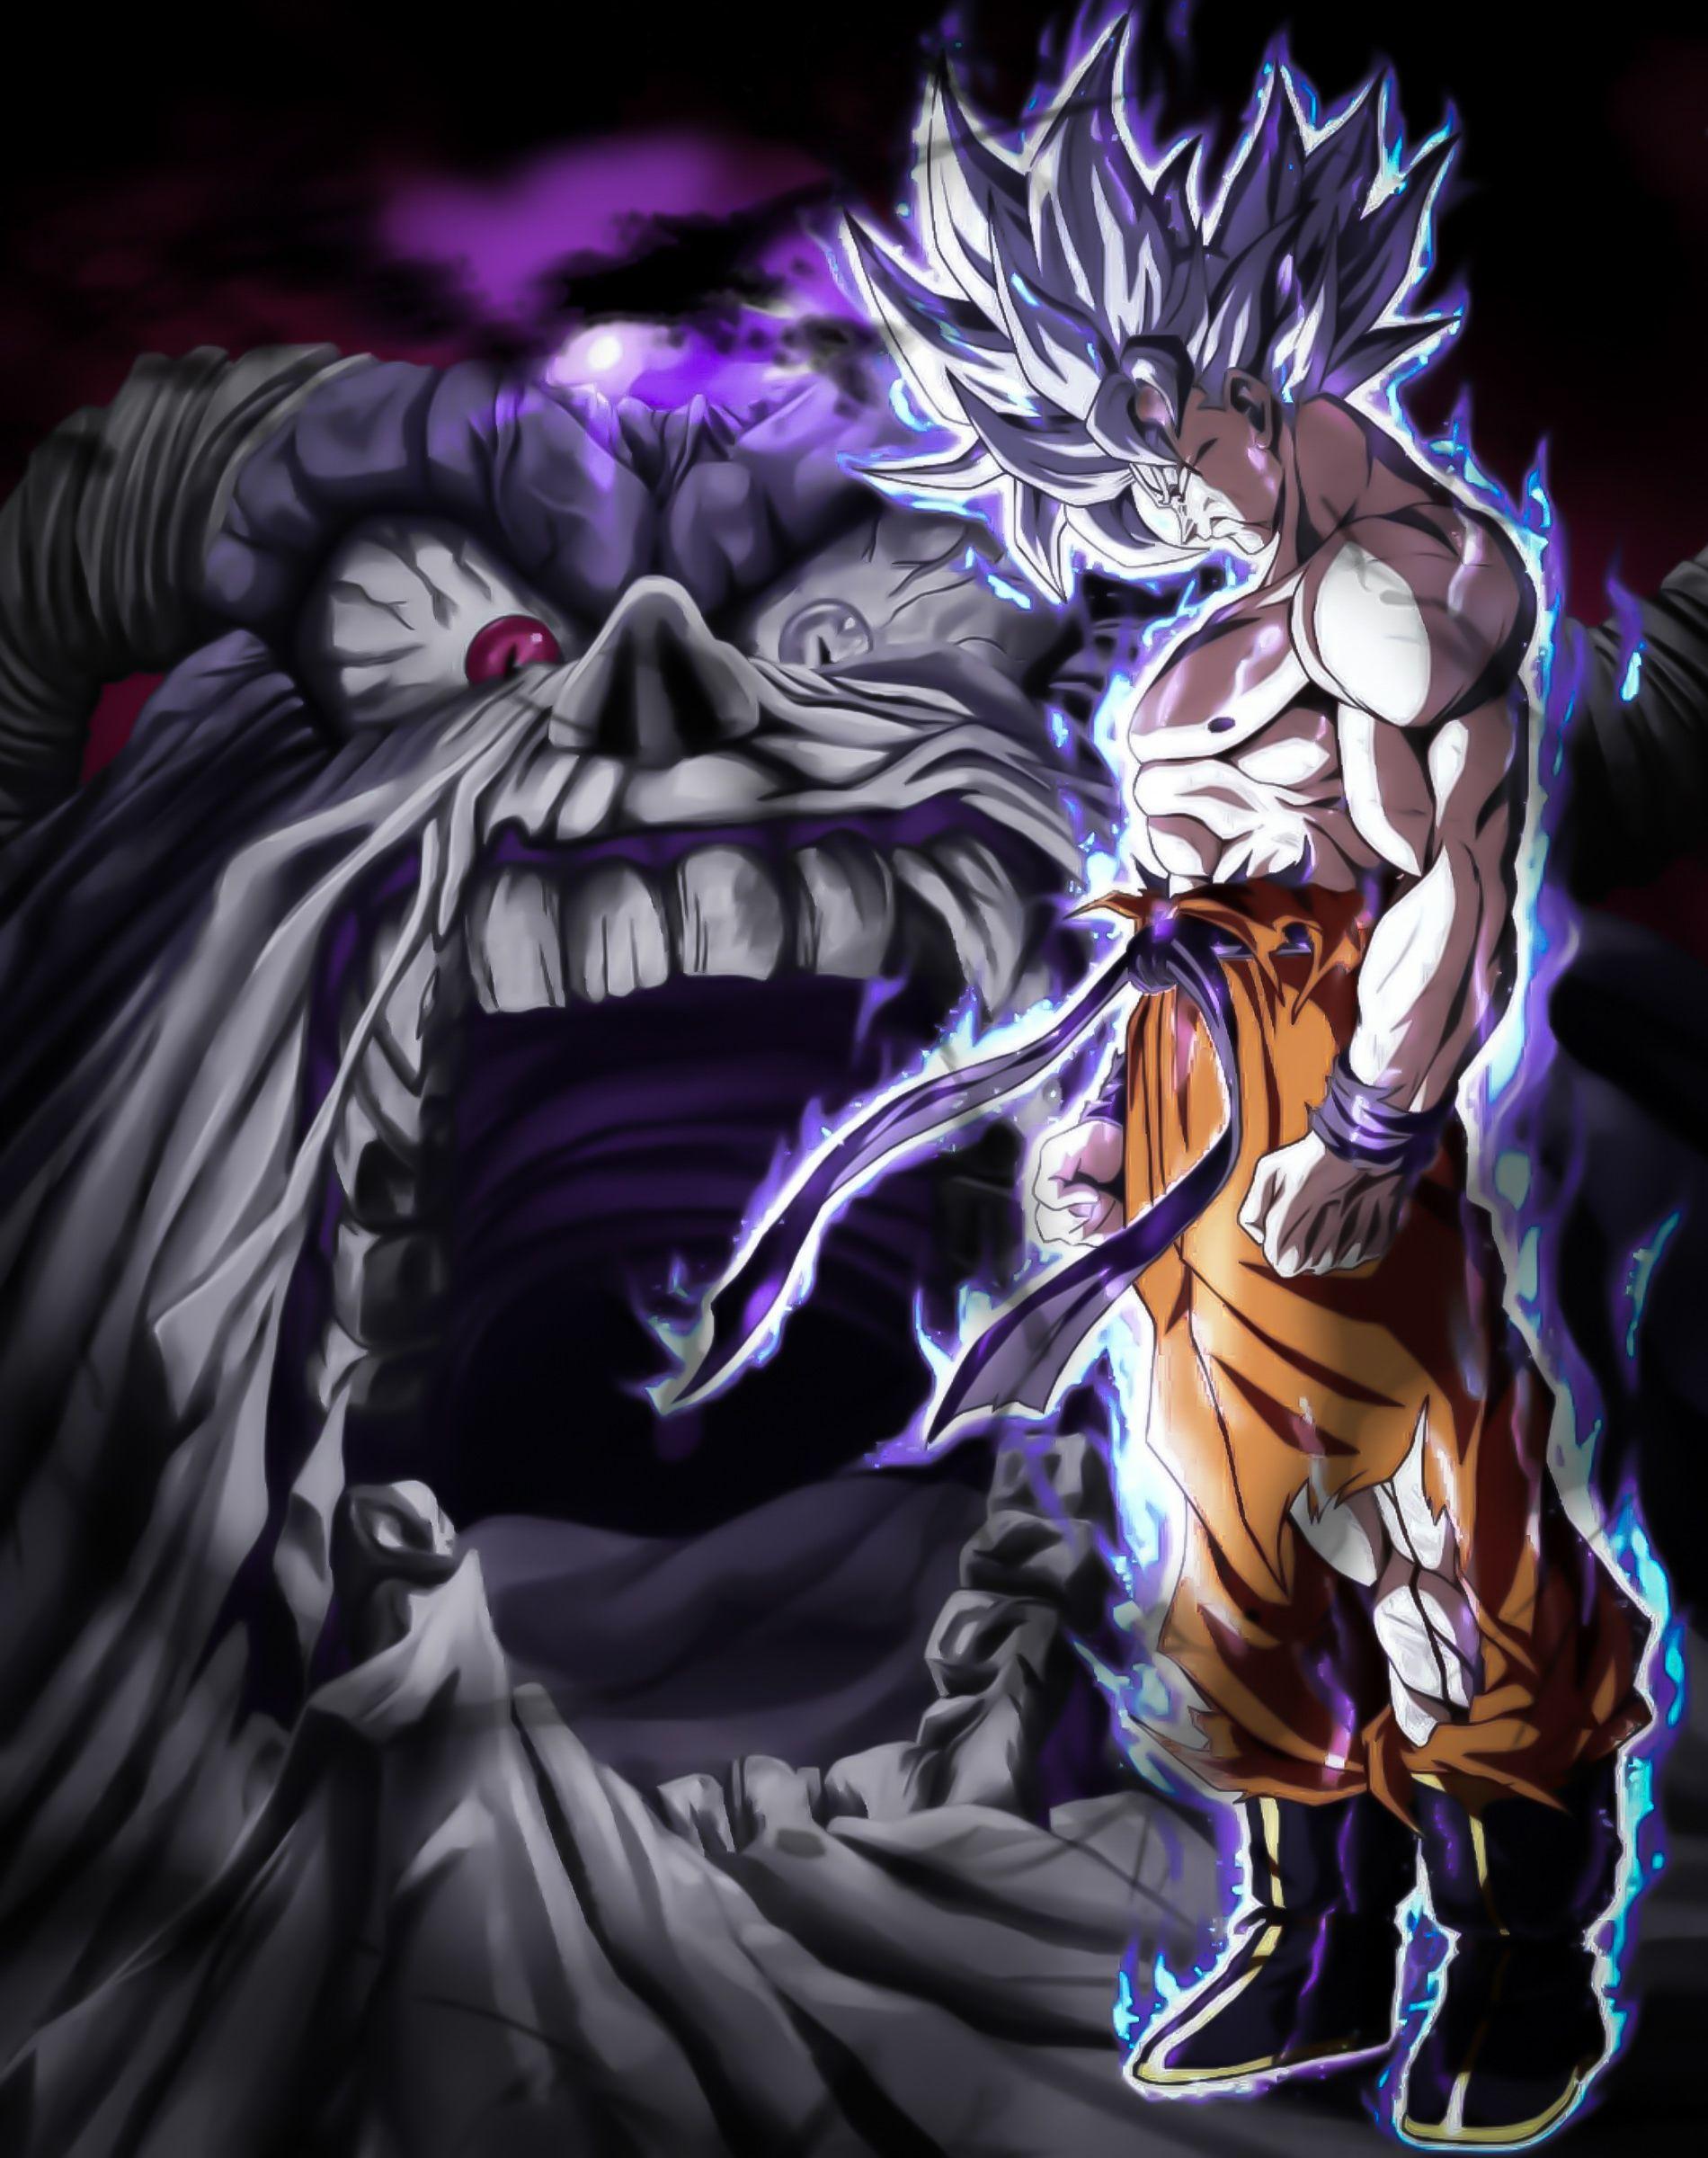 Planet Eater Moro Vs Mui Goku By Satzboom On Deviantart Anime Dragon Ball Super Dragon Ball Super Artwork Dragon Ball Art Goku